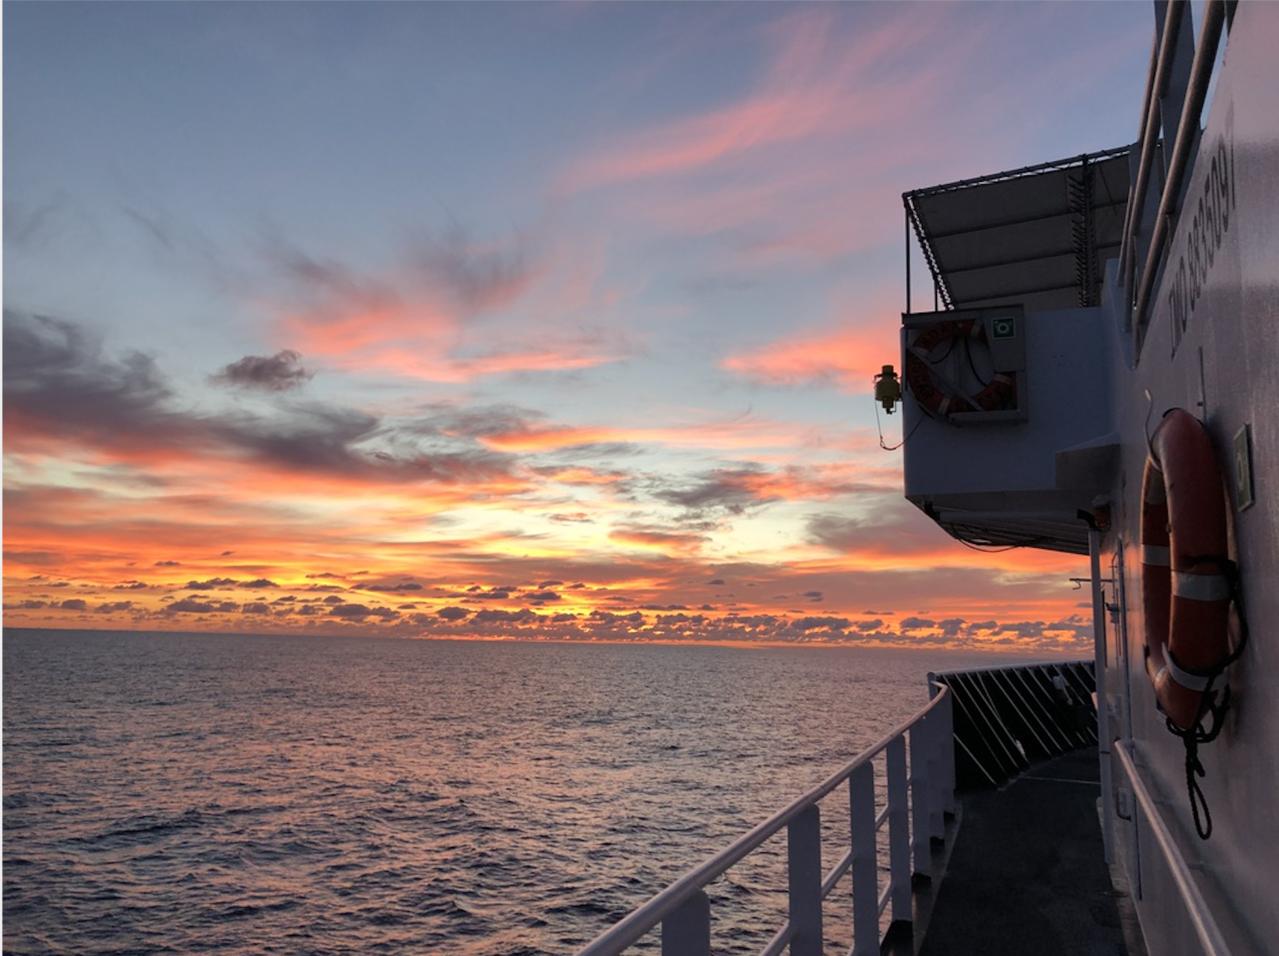 The Oscar Elton Sette sails into the sunset.